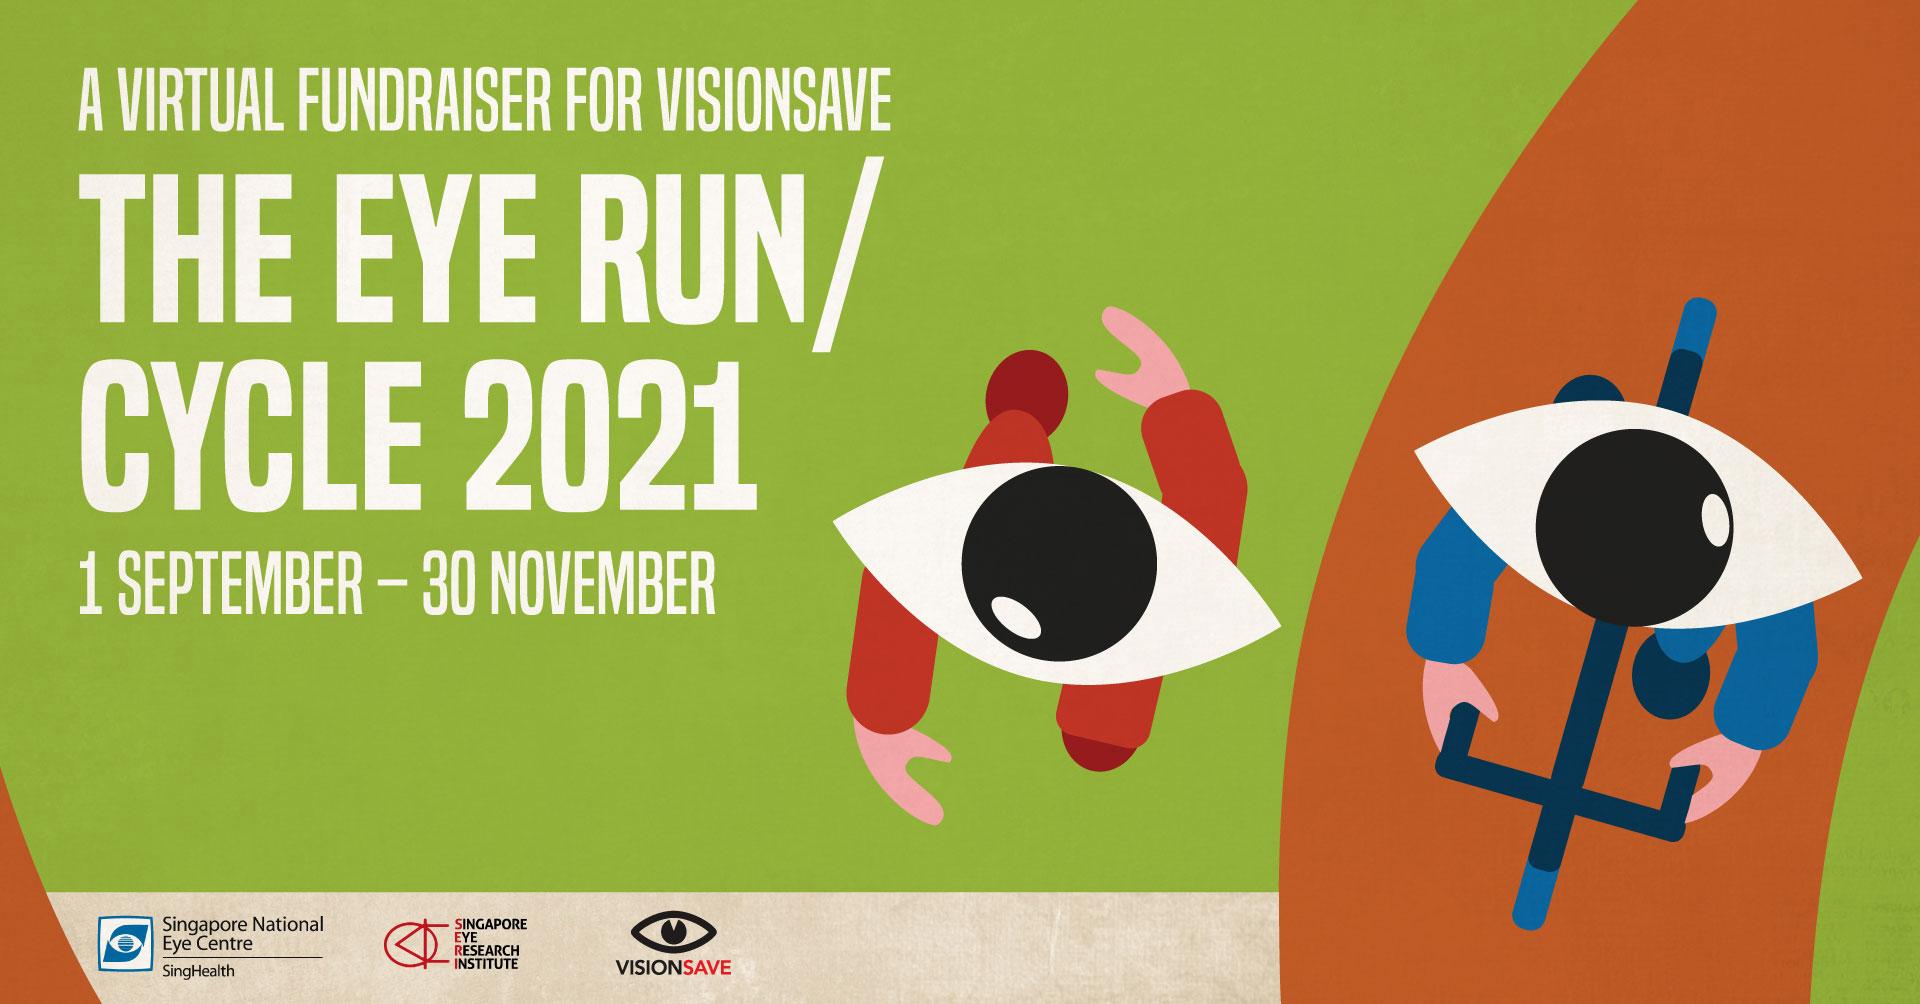 Logo of The Eye Run / Cycle 2021